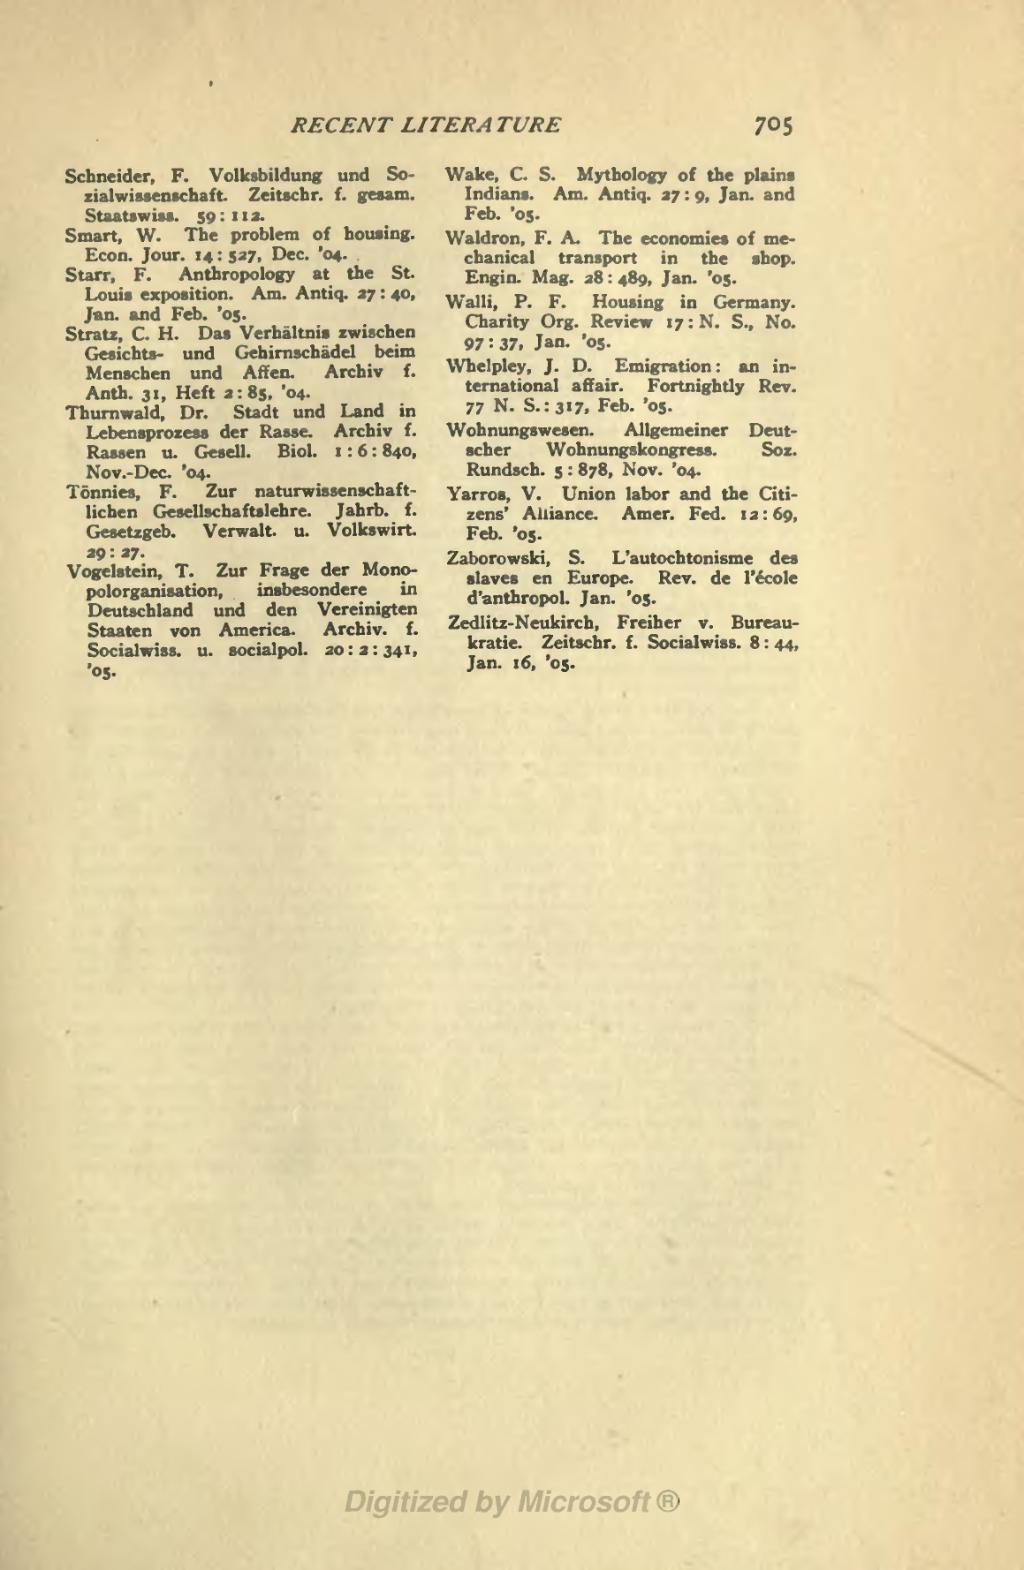 american journal of sociology book reviews